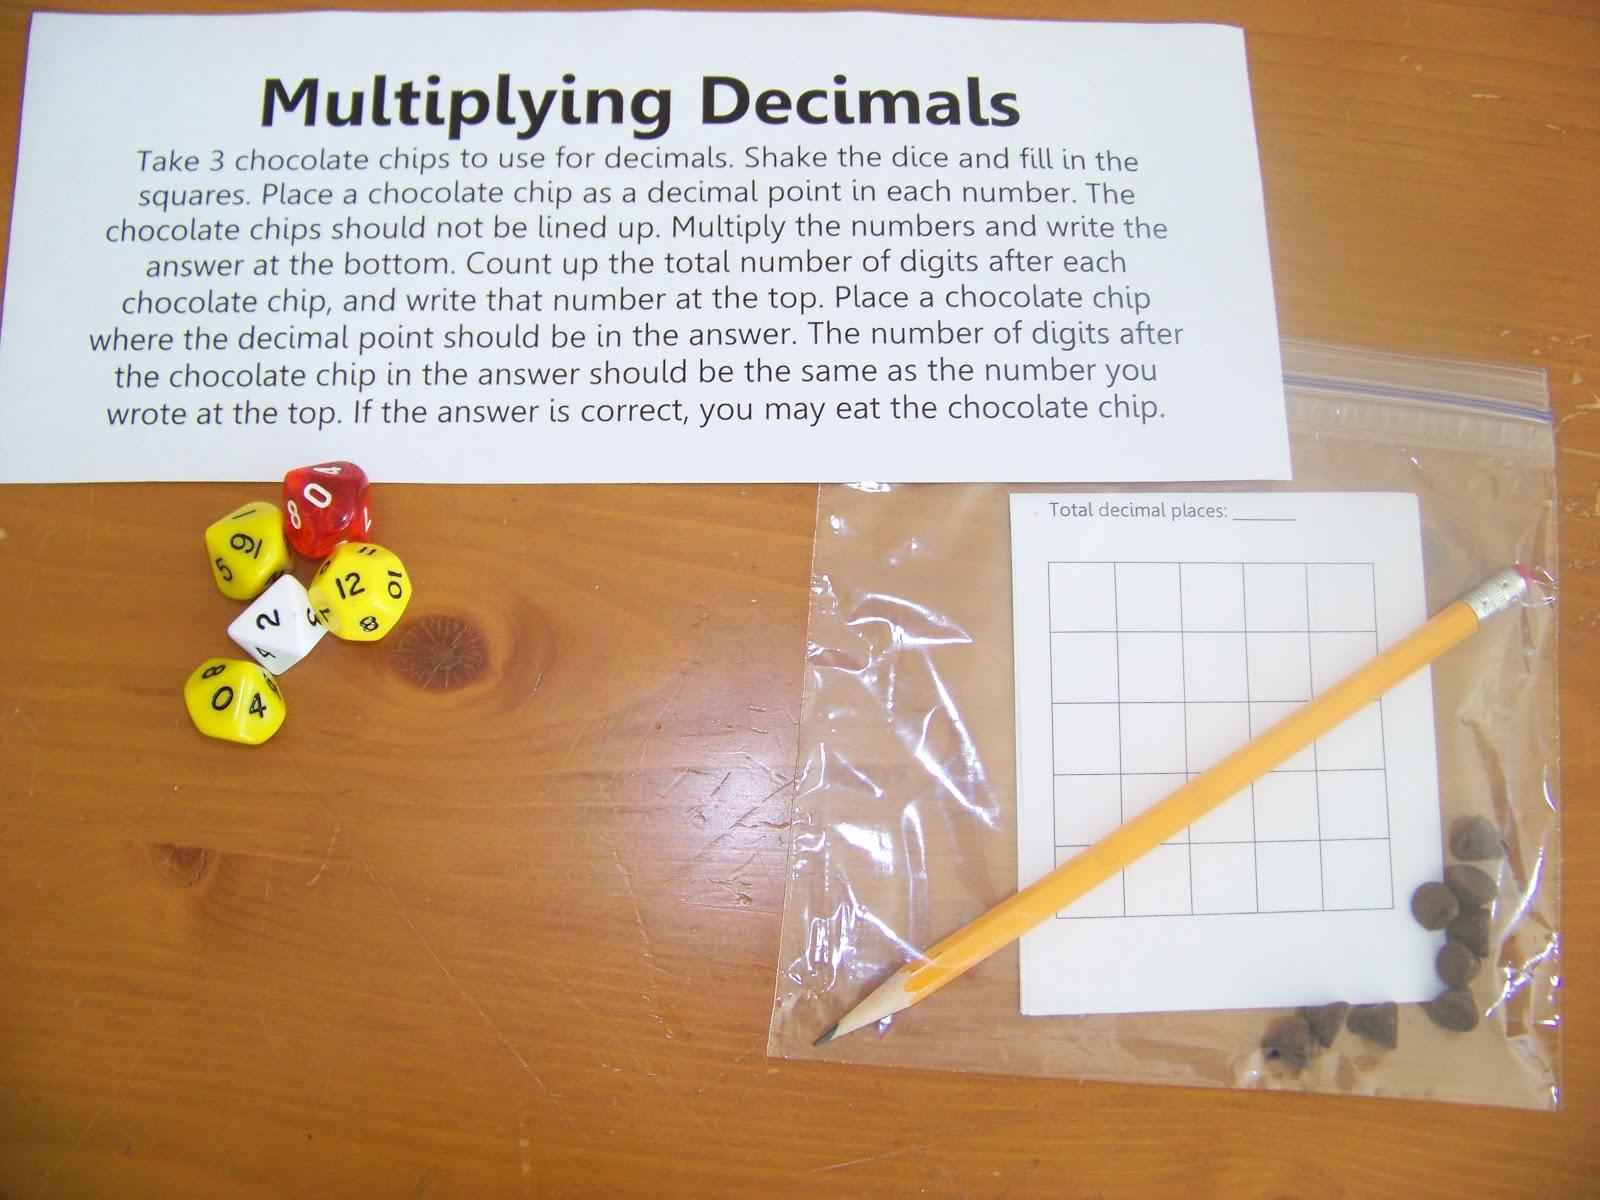 Our Fun Homeschool Chocolate Chip Decimal Multiplication